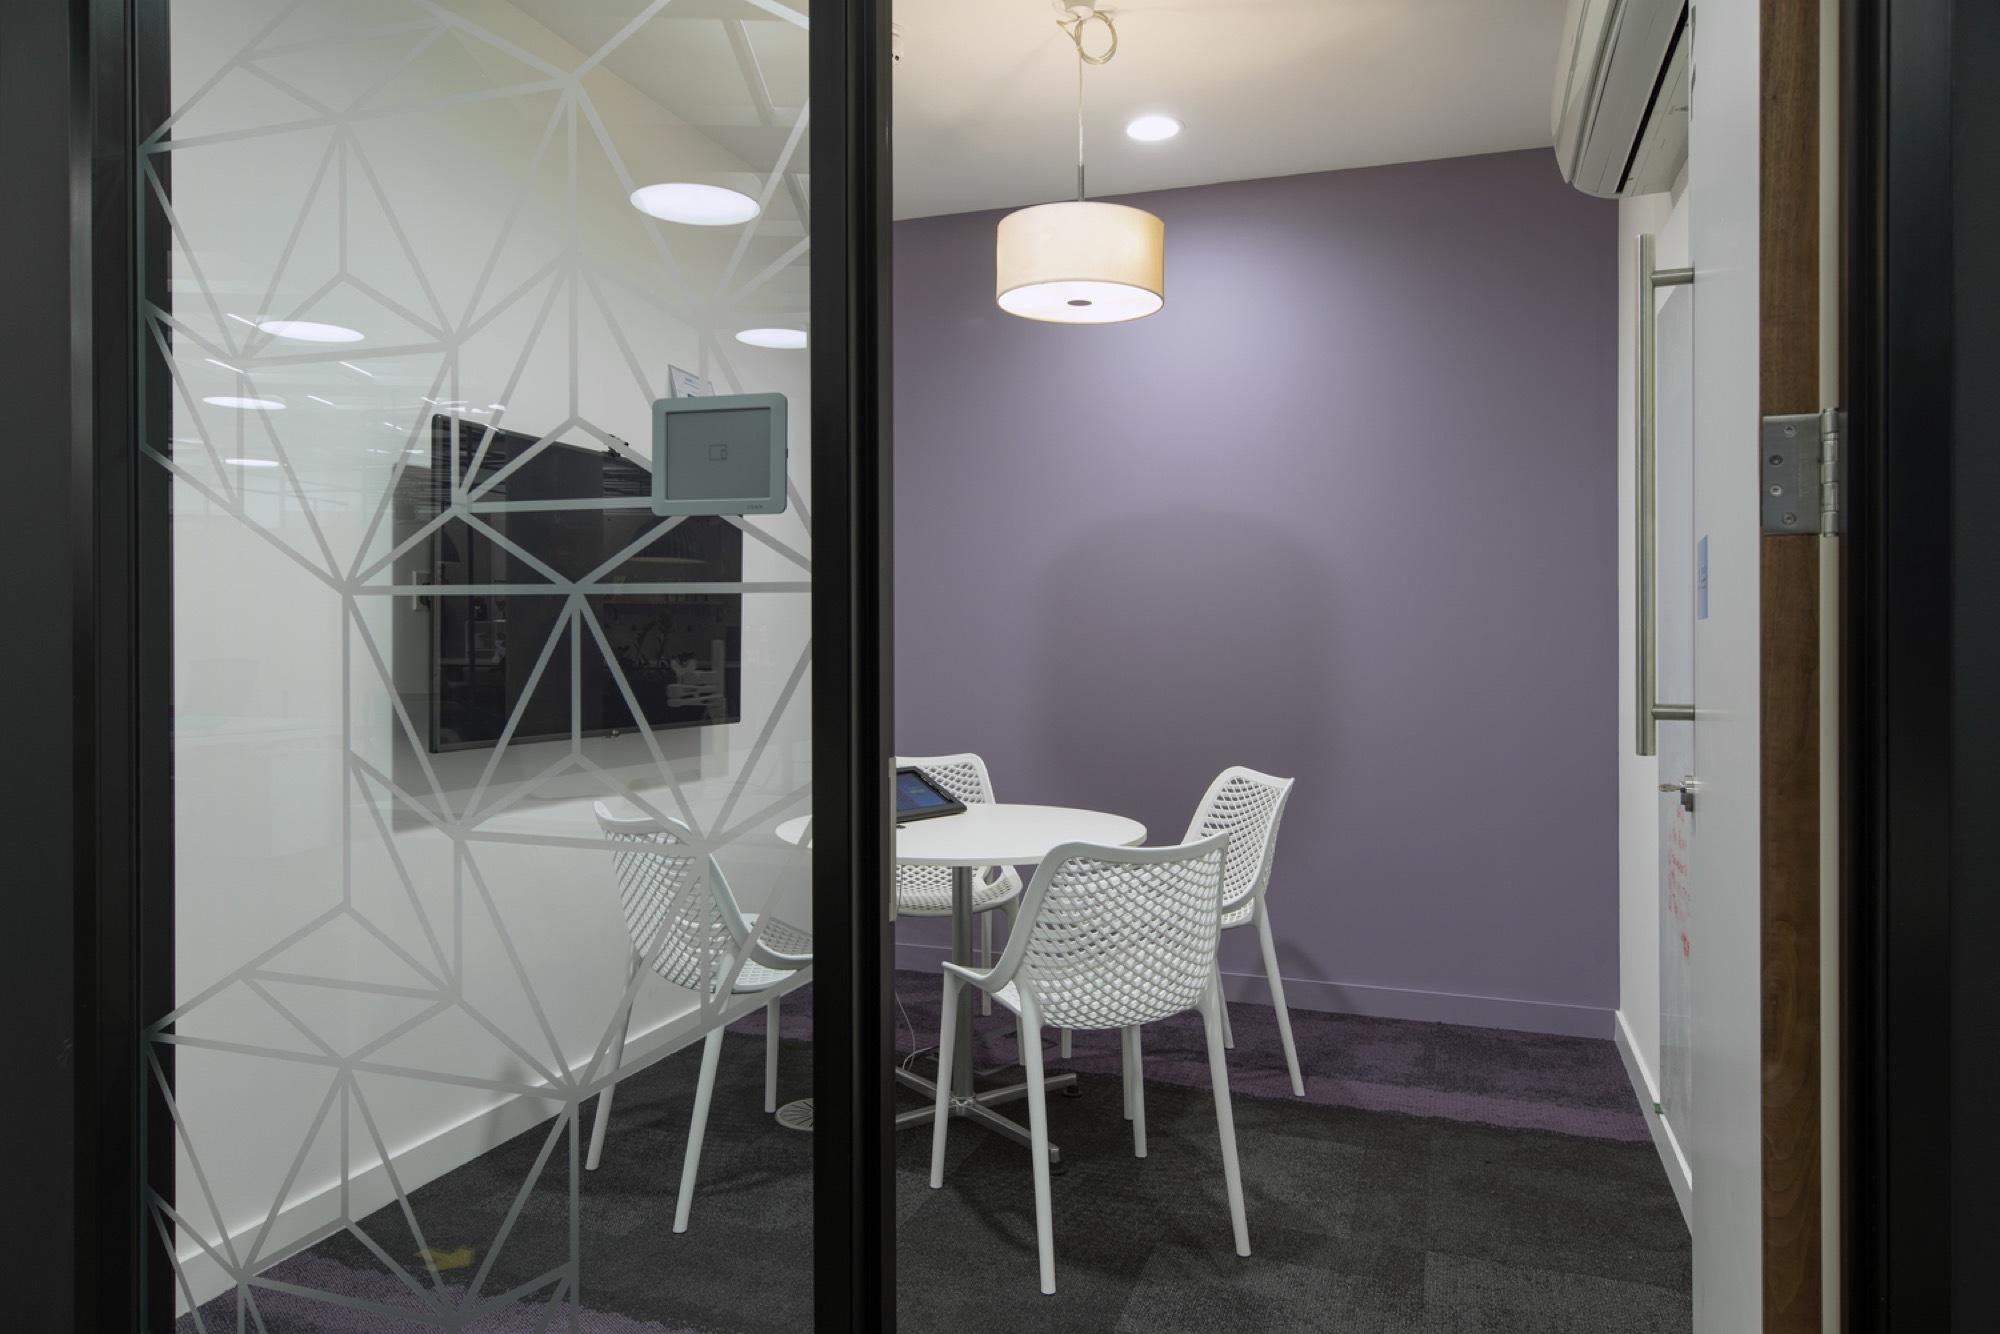 Metapack modern meeting pod design